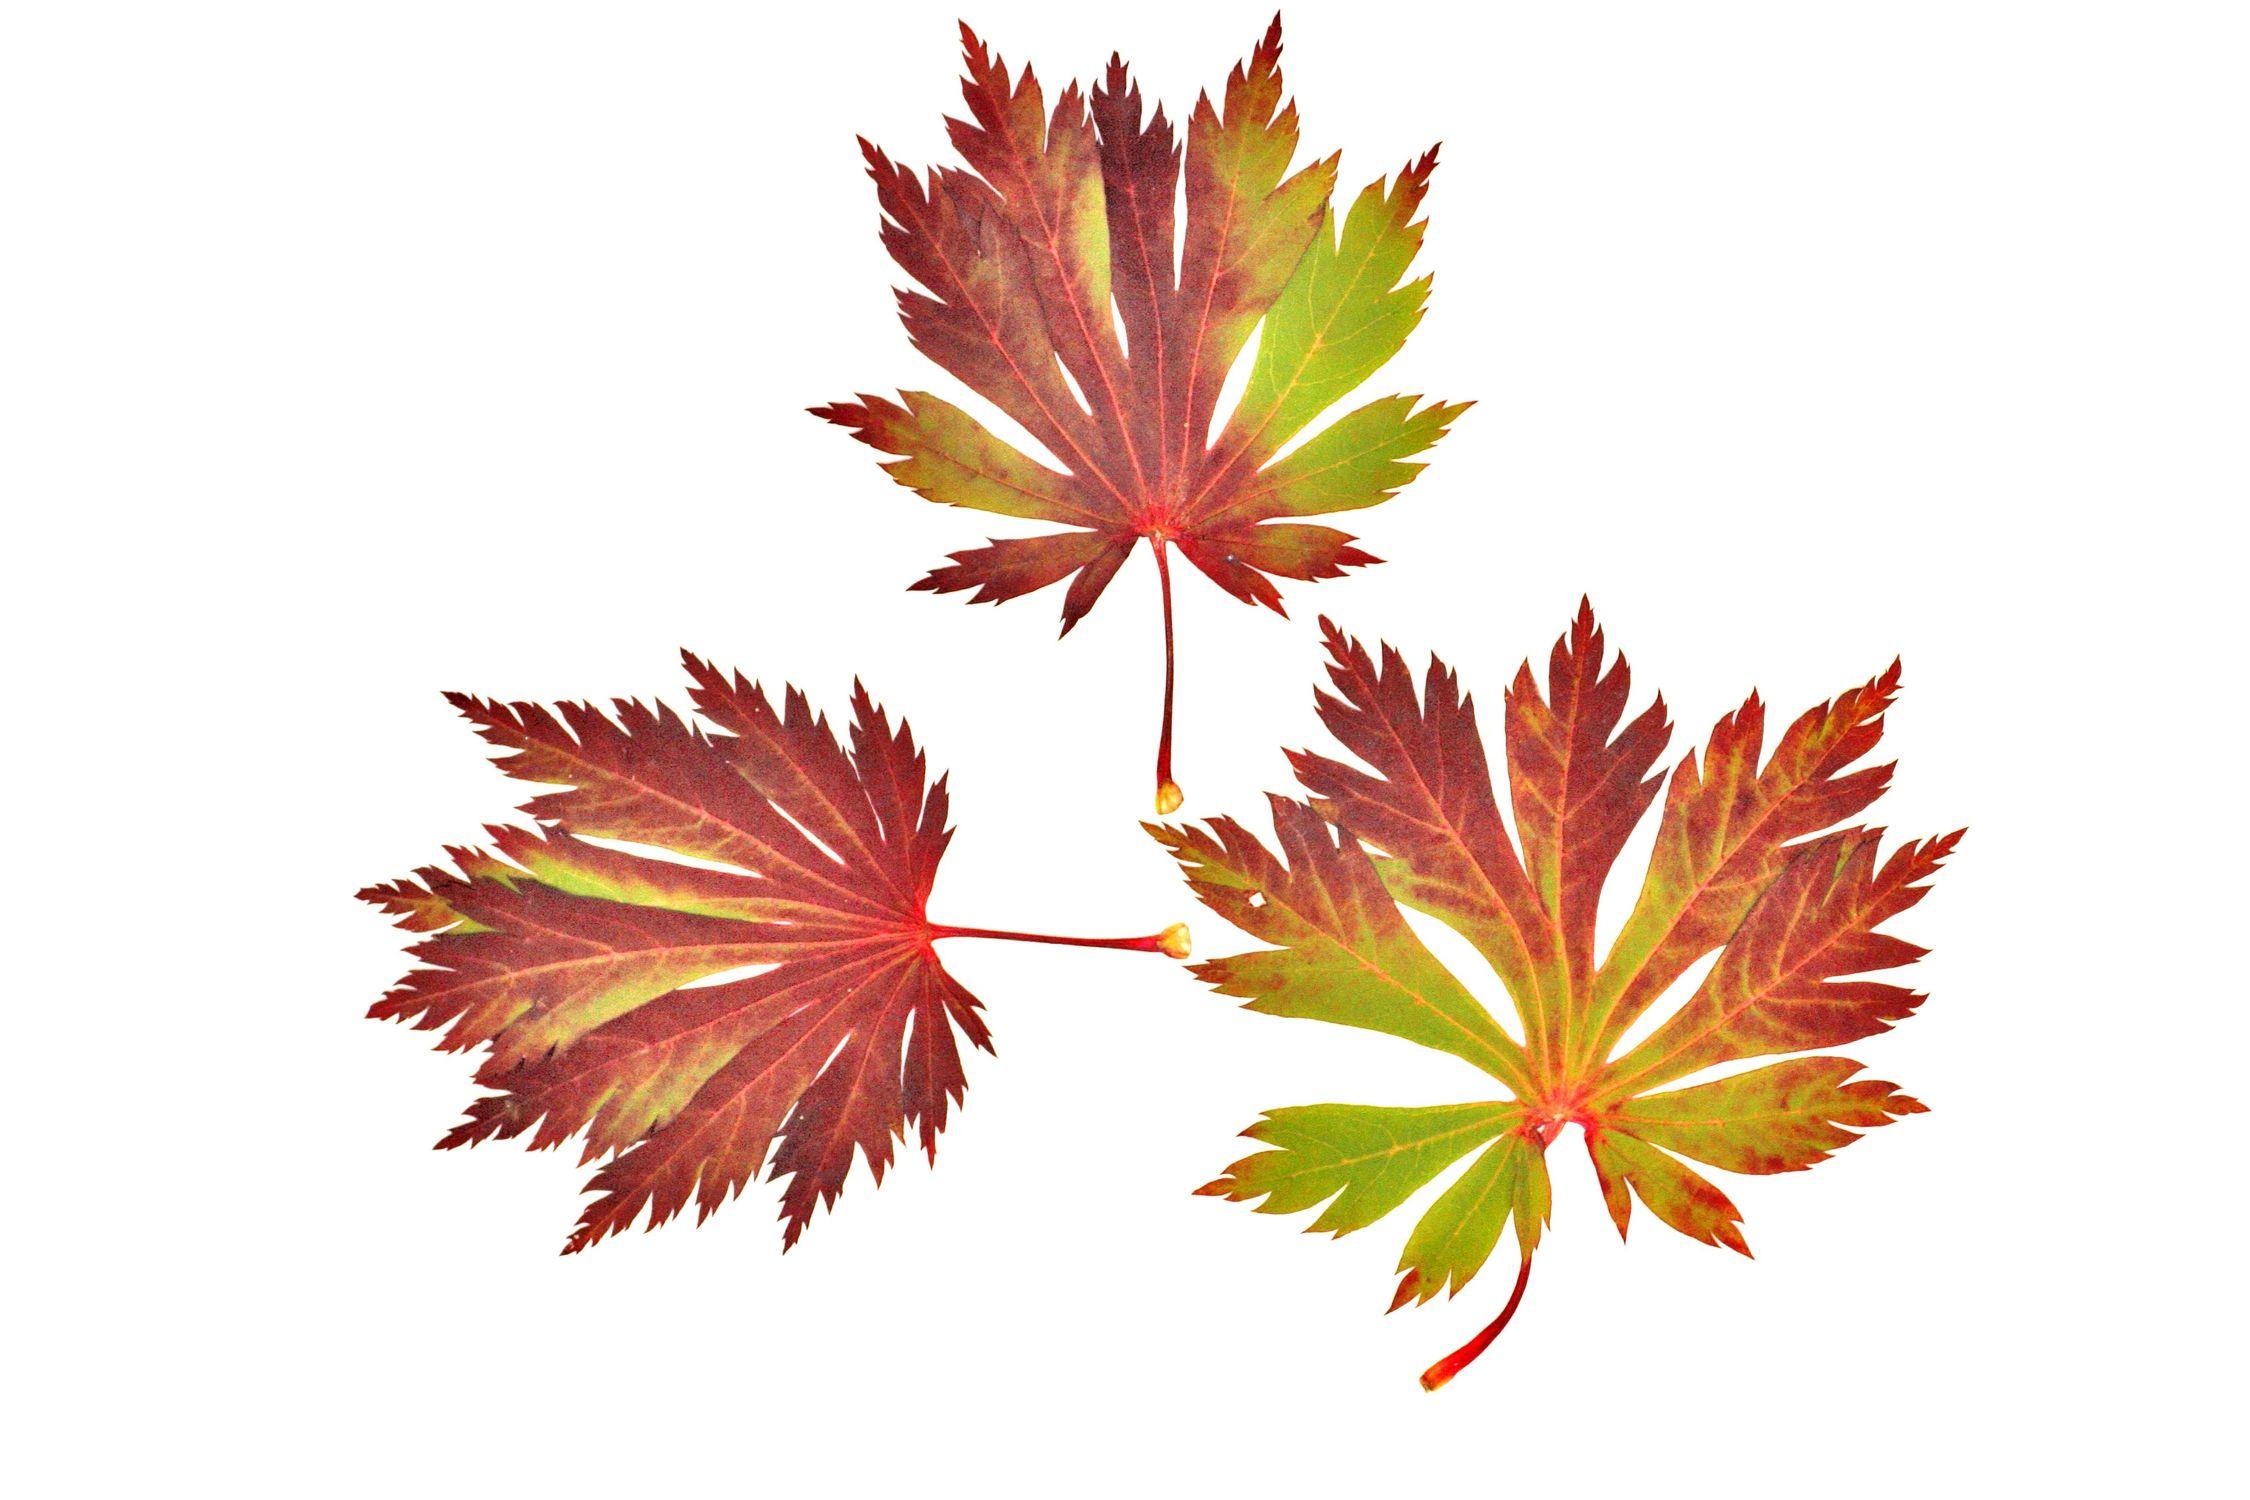 Bild mit Natur, Pflanzen, Bäume, Jahreszeiten, Blumen, Herbst, Struktur, Blätter, Blatt, Blattstruktur, Blätterstruktur